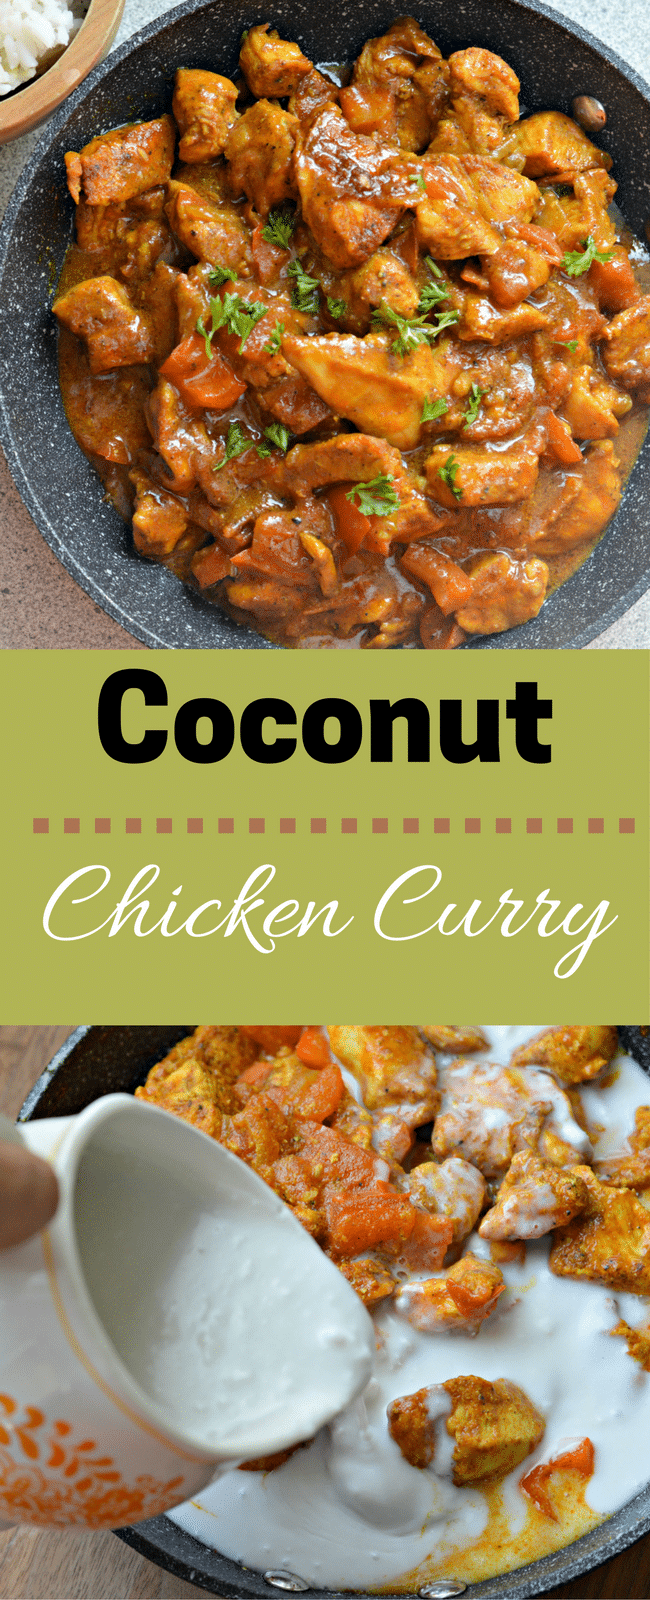 Homemade coconut chicken curry recipe chicken curry recipes homemade coconut chicken curry chicken curry recipescoconut chickenmeal recipesfree recipesthai food recipesindian forumfinder Gallery